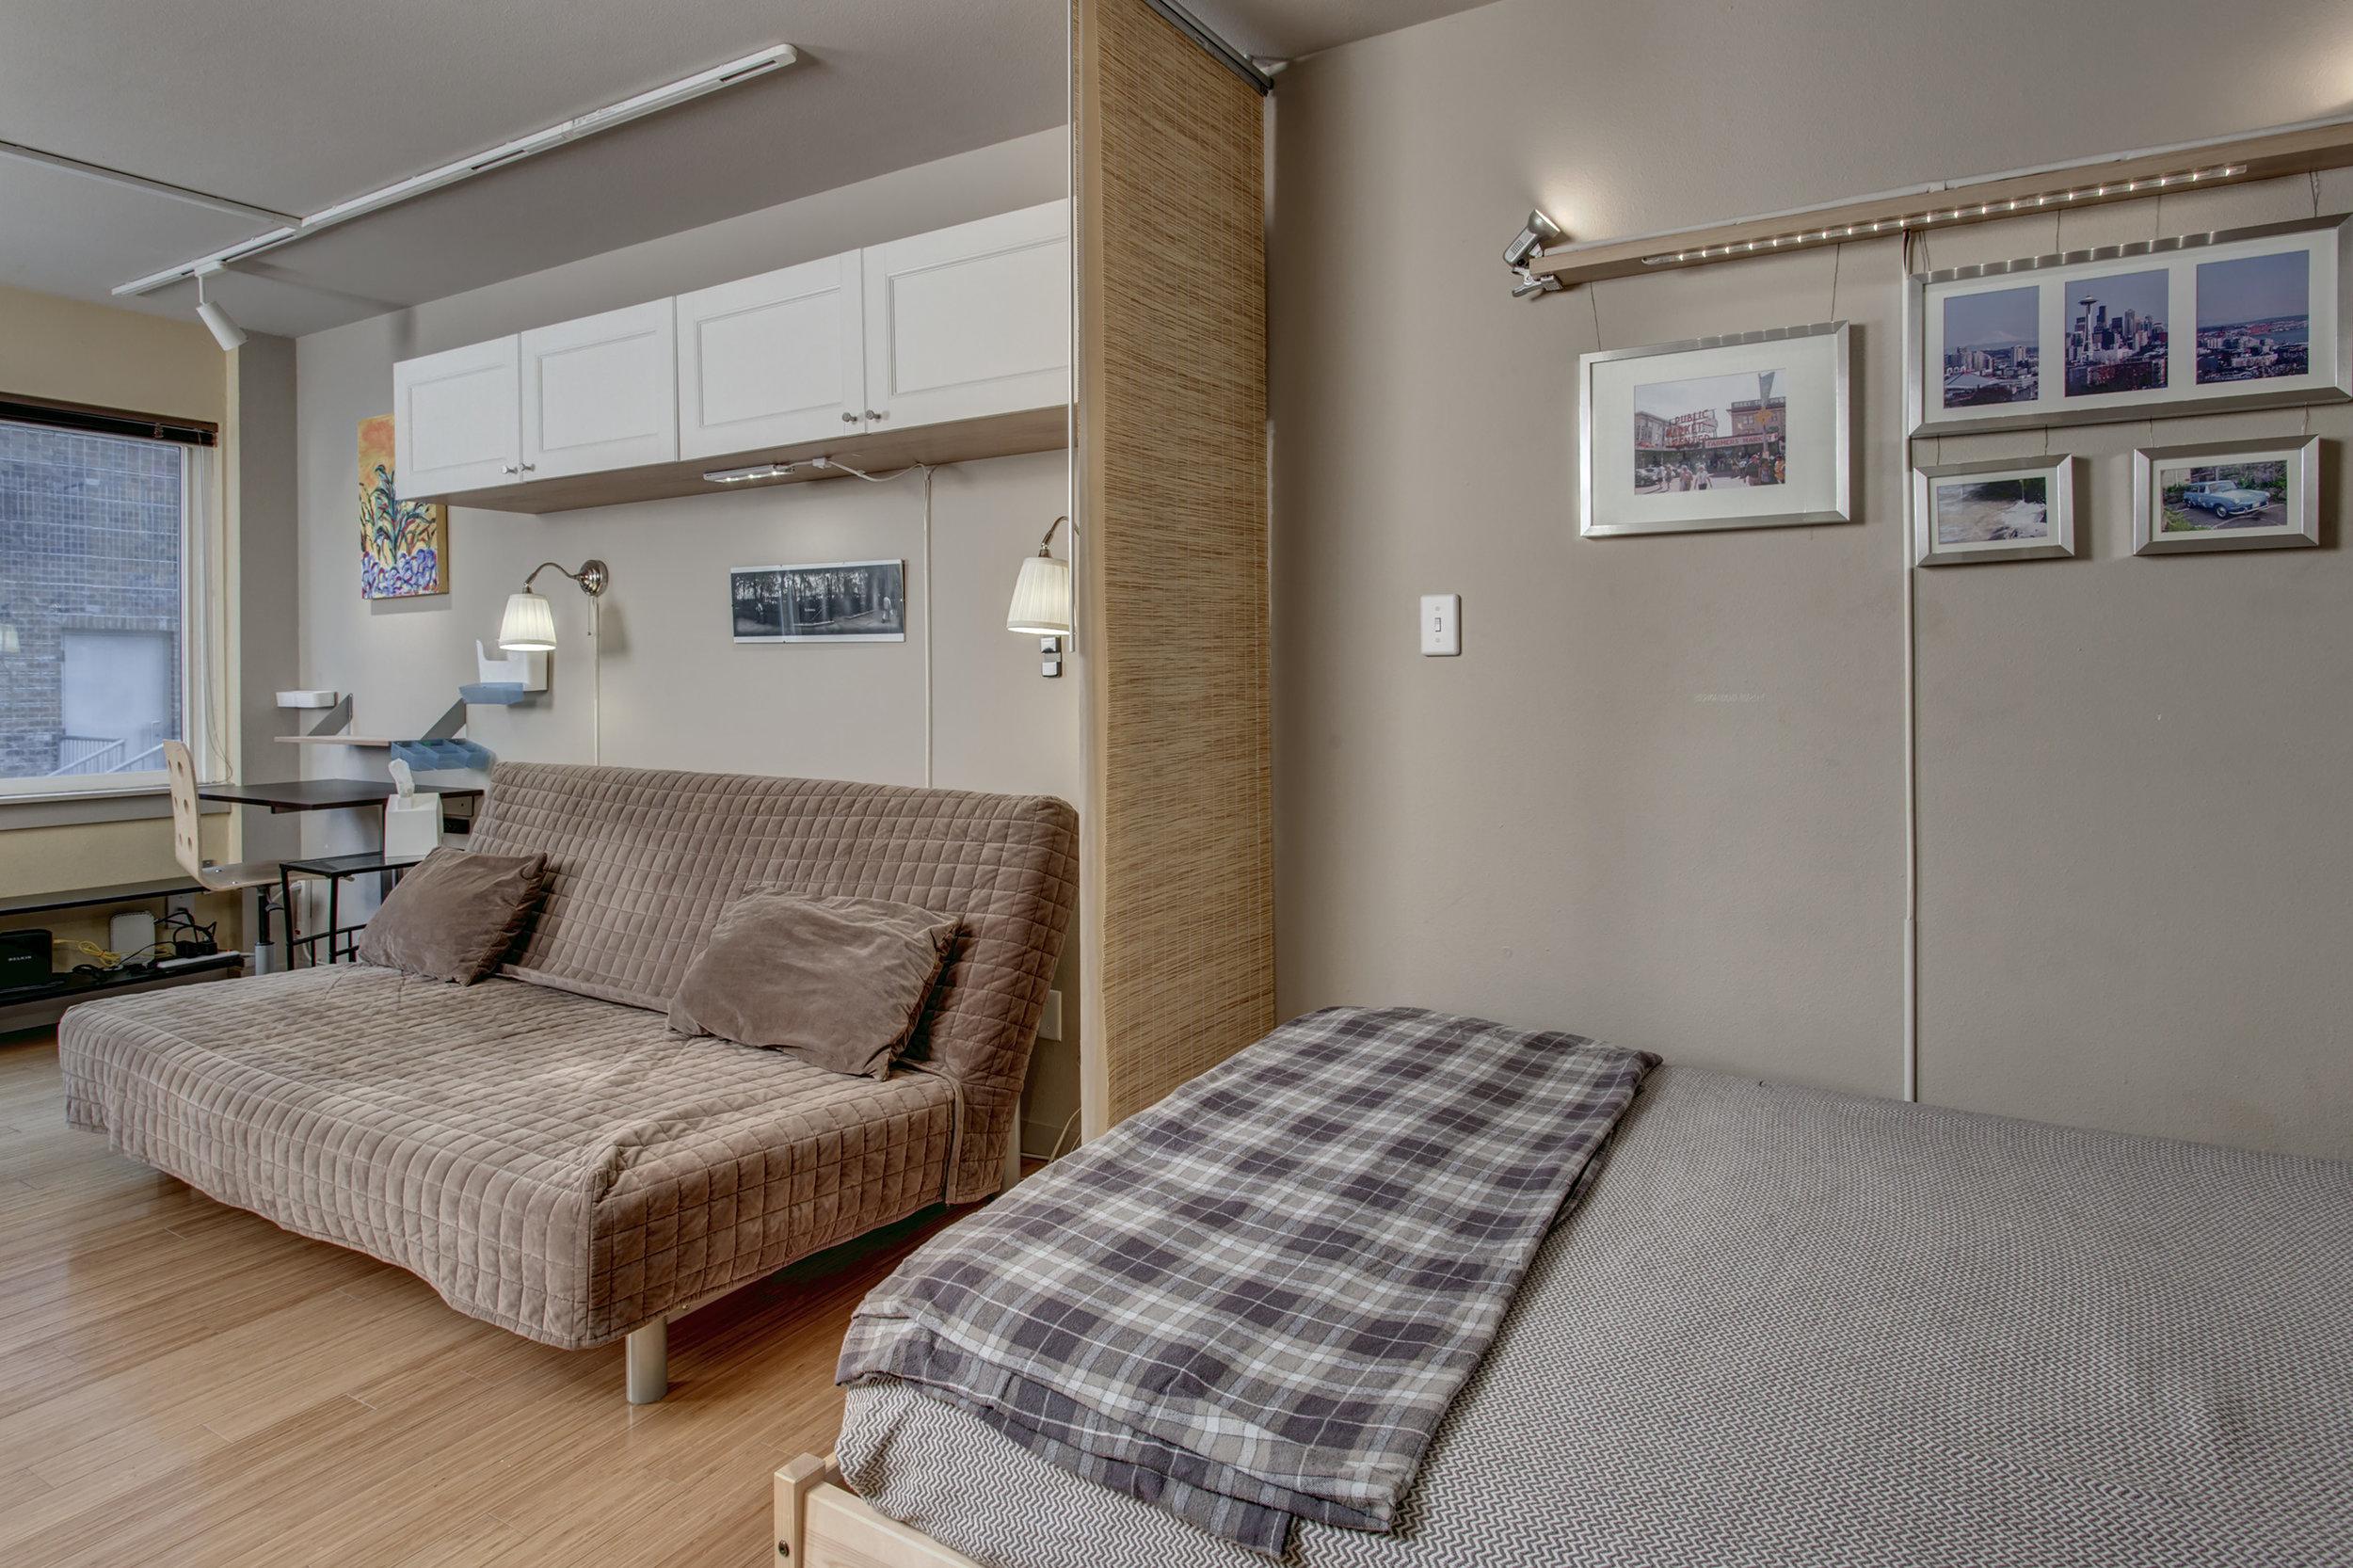 15-Bedroom04.jpg